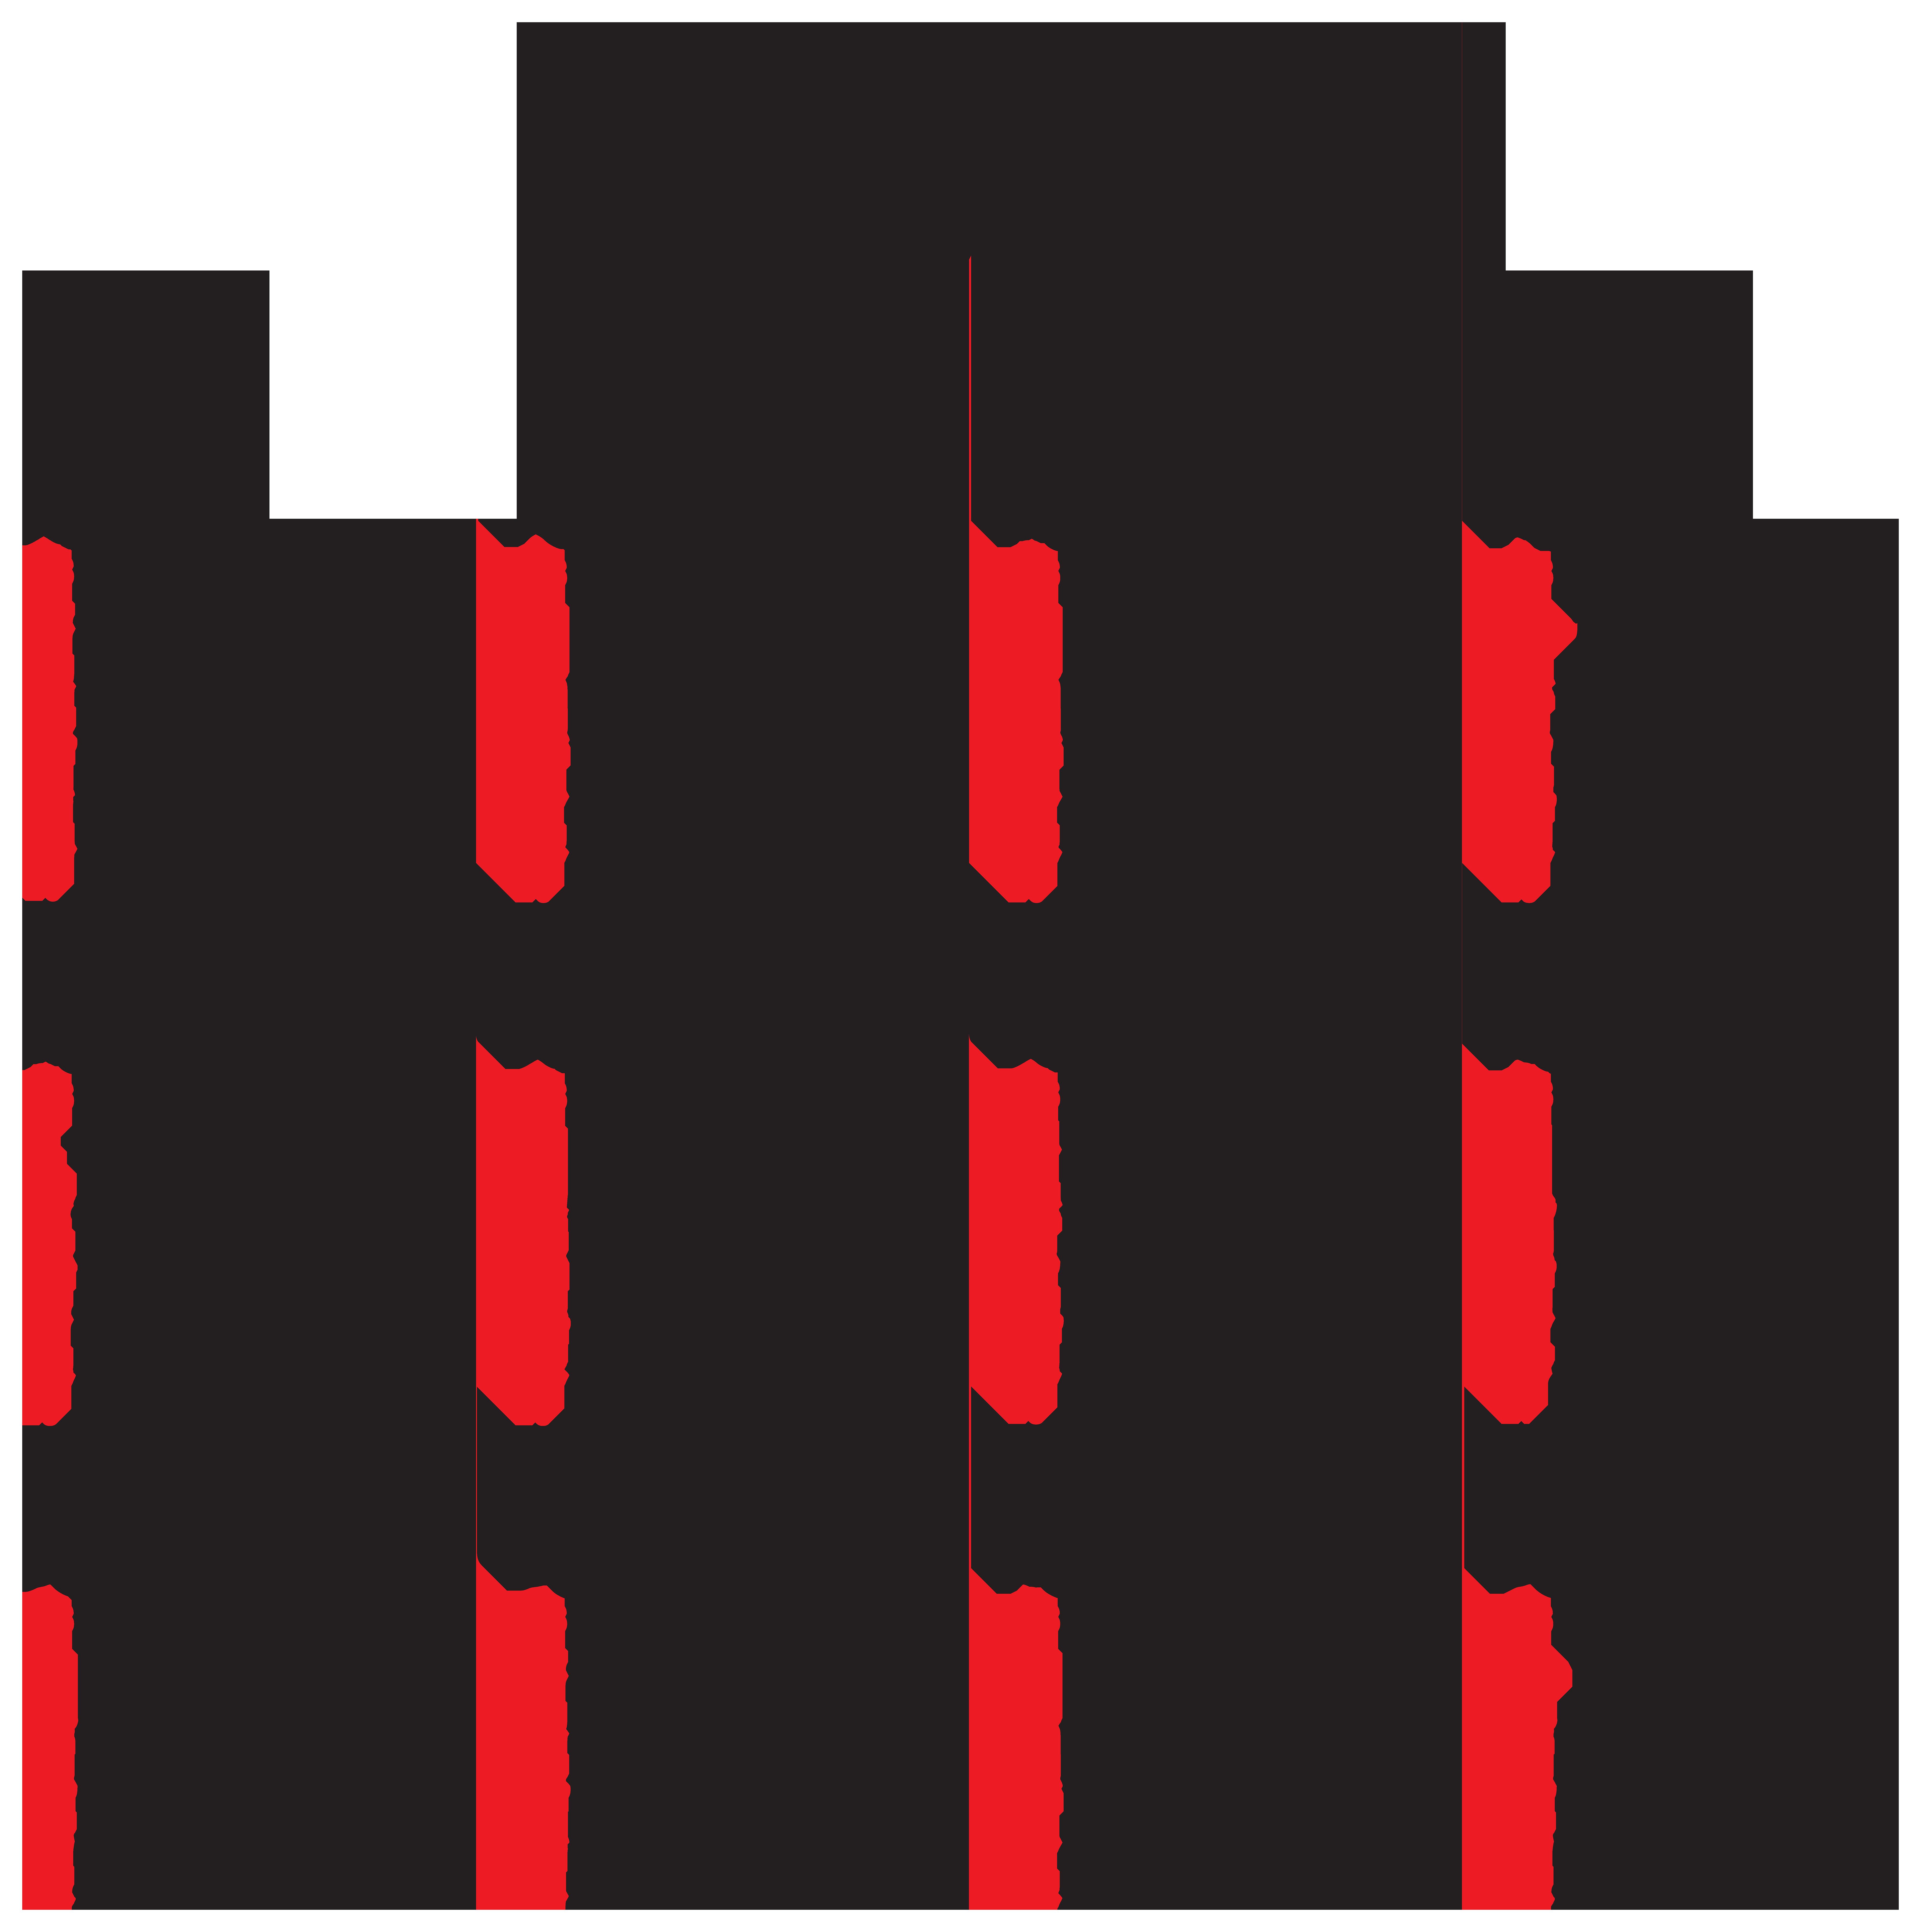 Calendar Clip Art Transparent Background : Calendar transparent png clip art image clipart